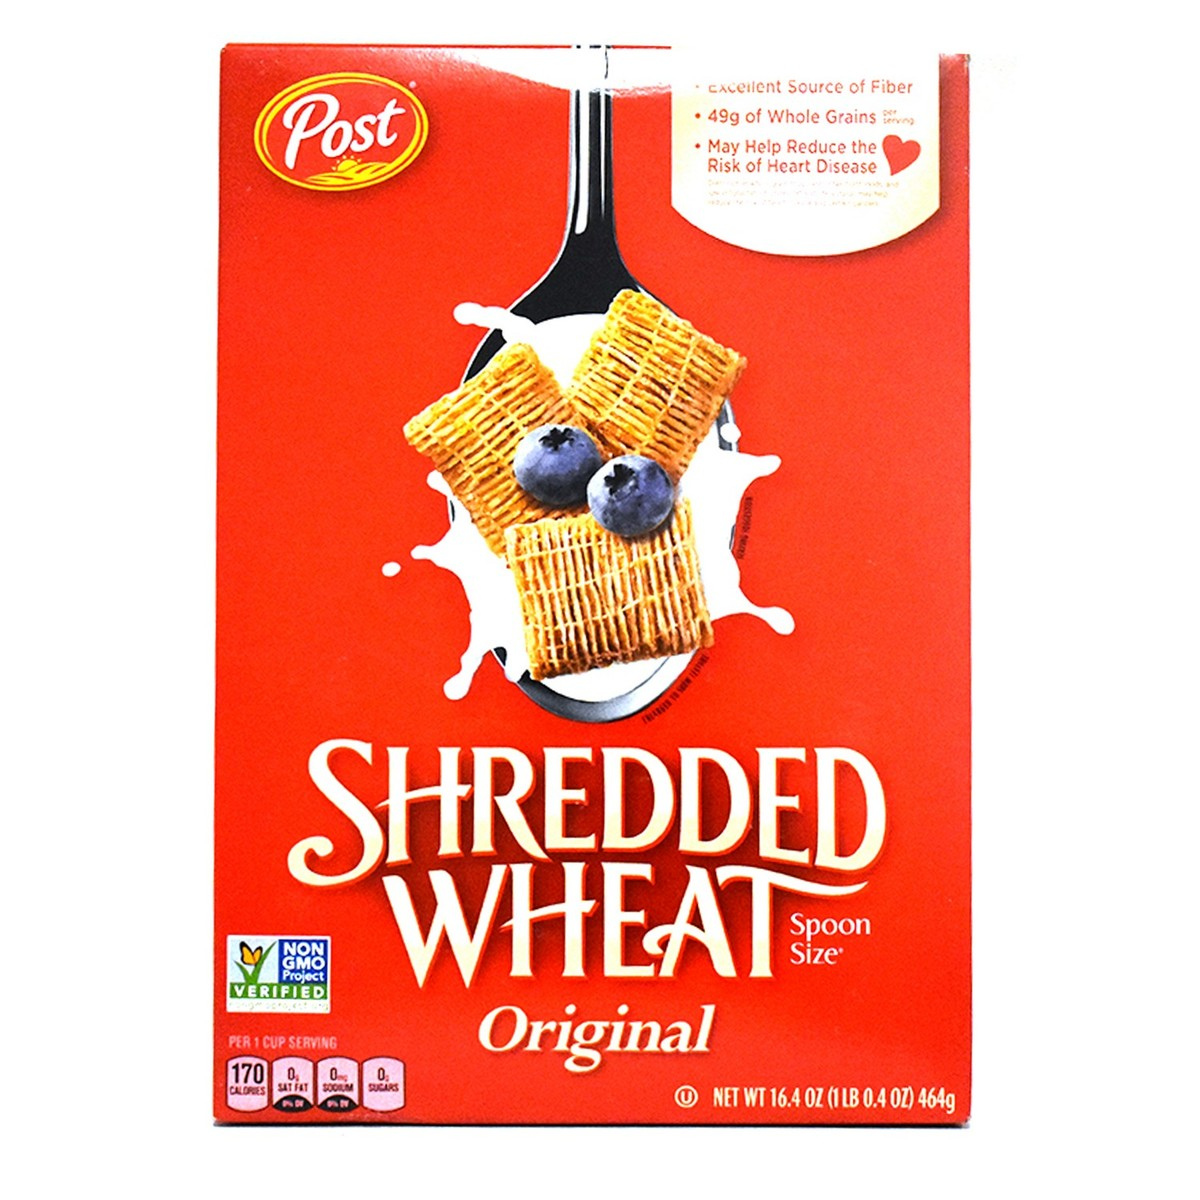 coupon rabais Post Shredded Wheat Original